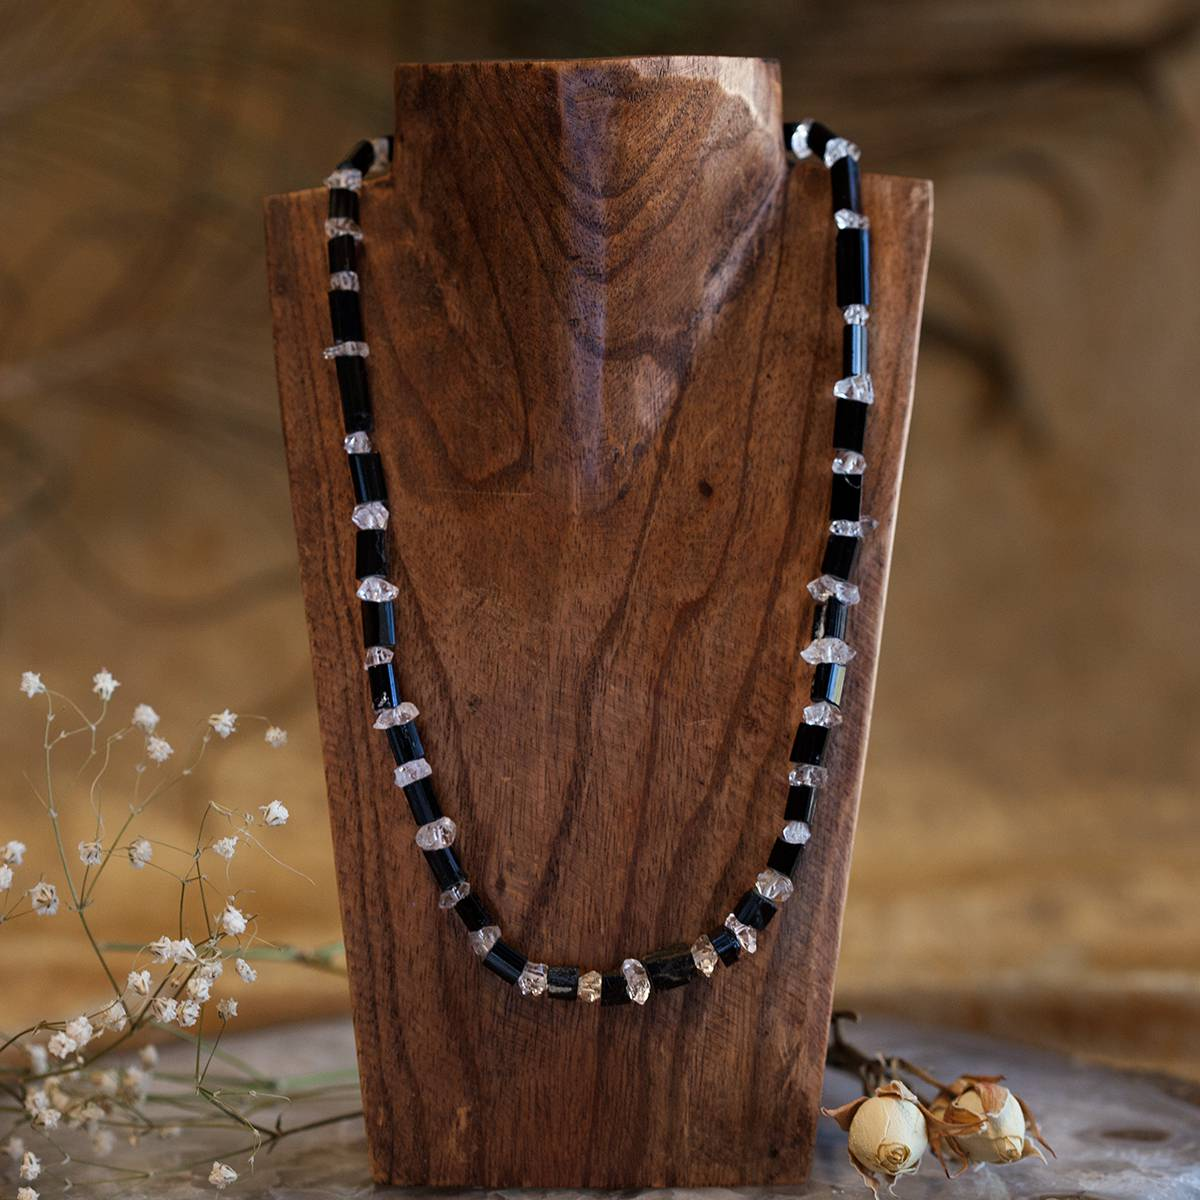 black tourmaline and herkimer diamond necklaces